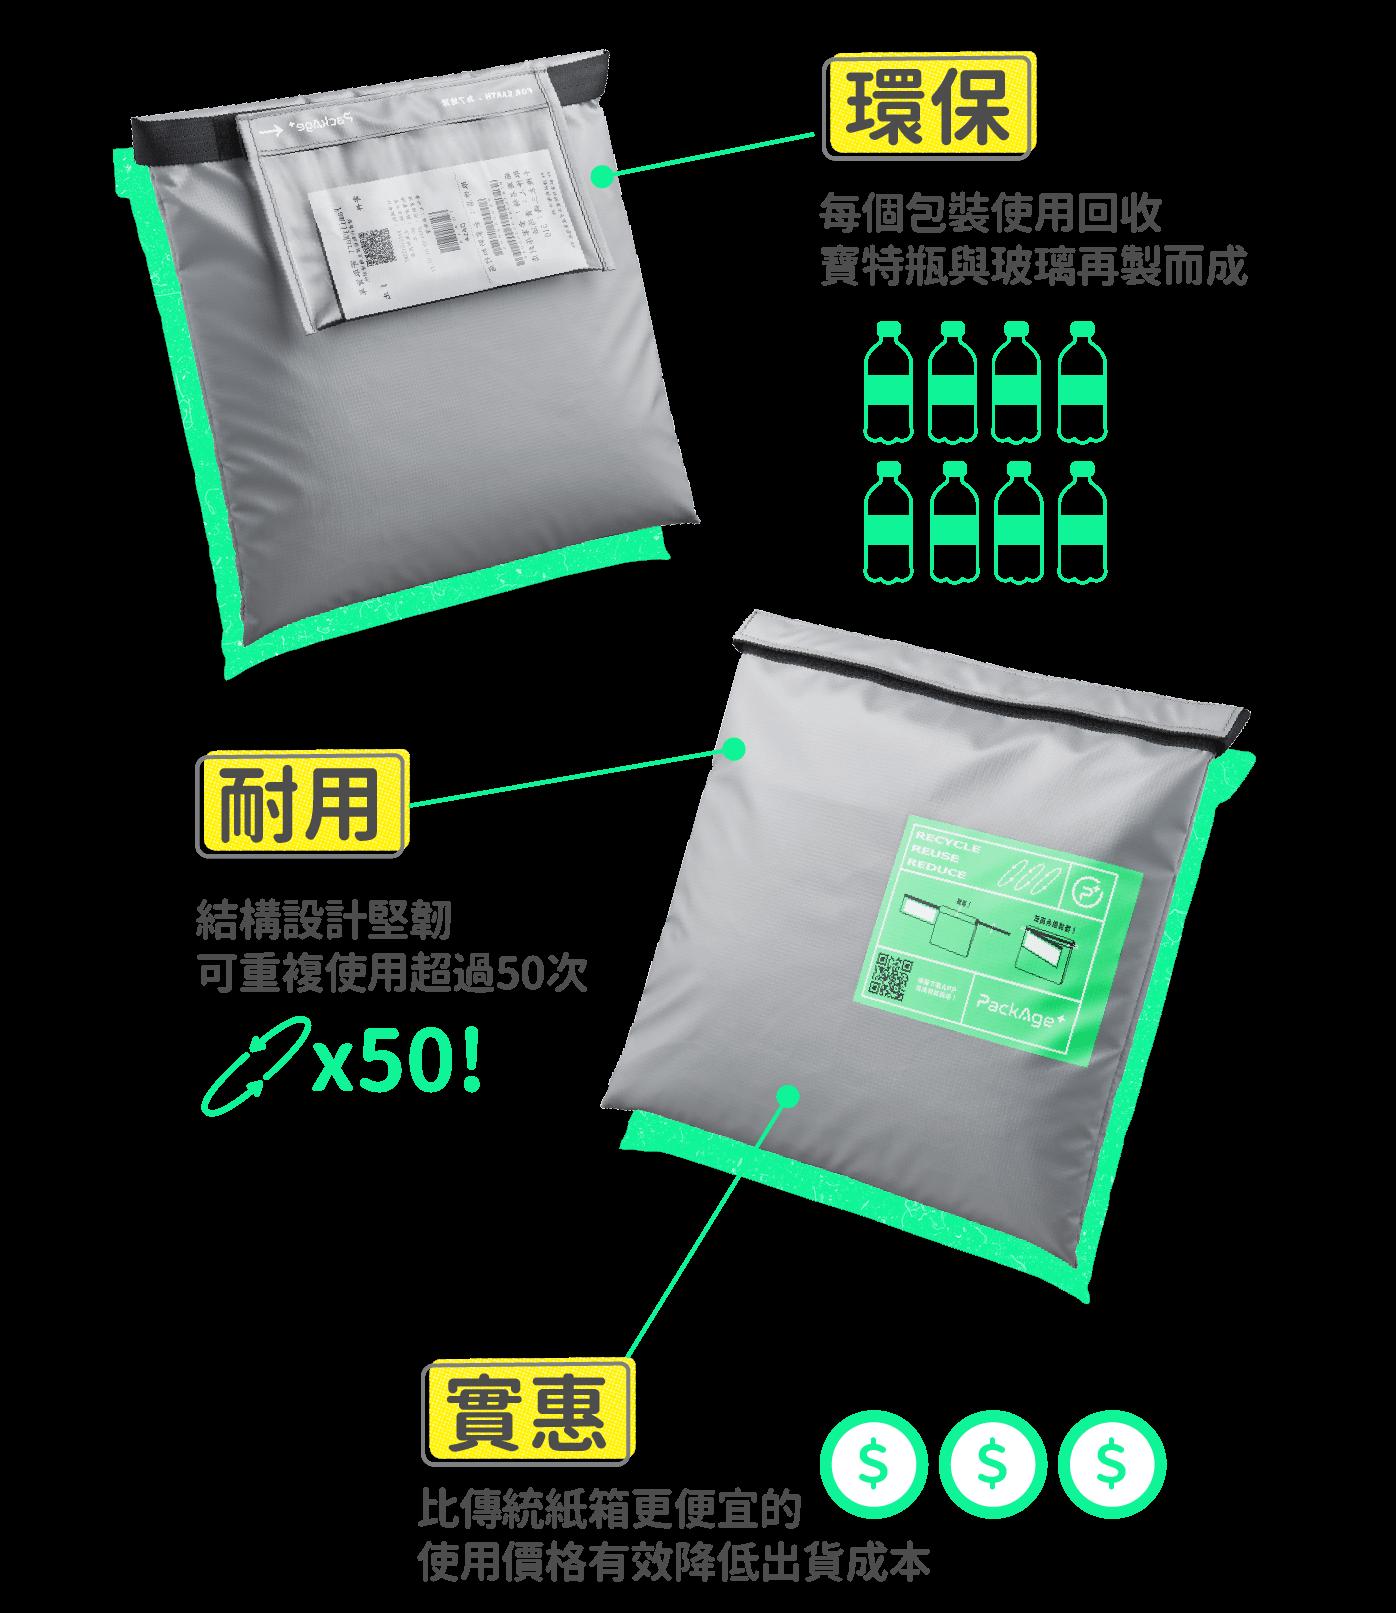 PackAge+網購包裝袋耐用又實惠